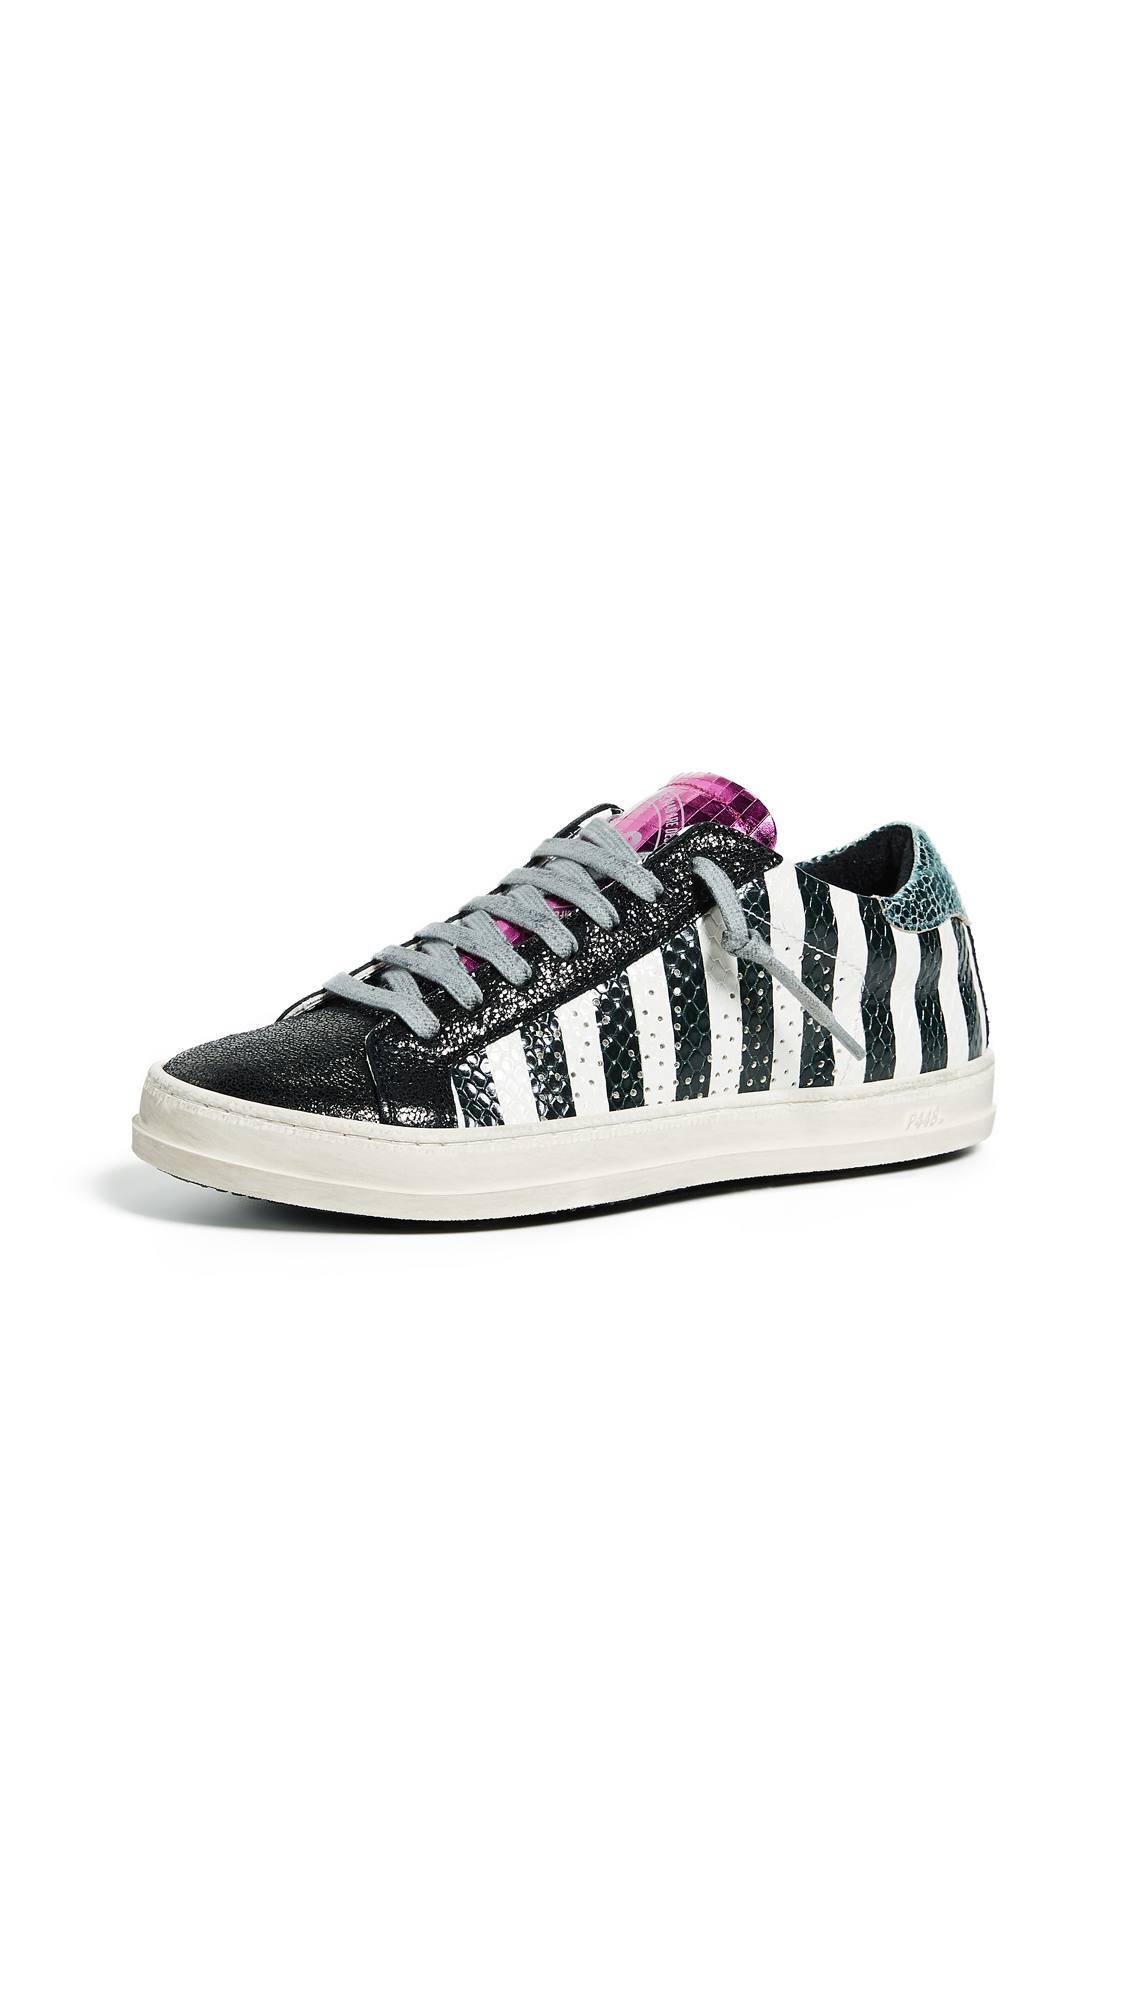 P448 John Sneakers - Stripe Vip